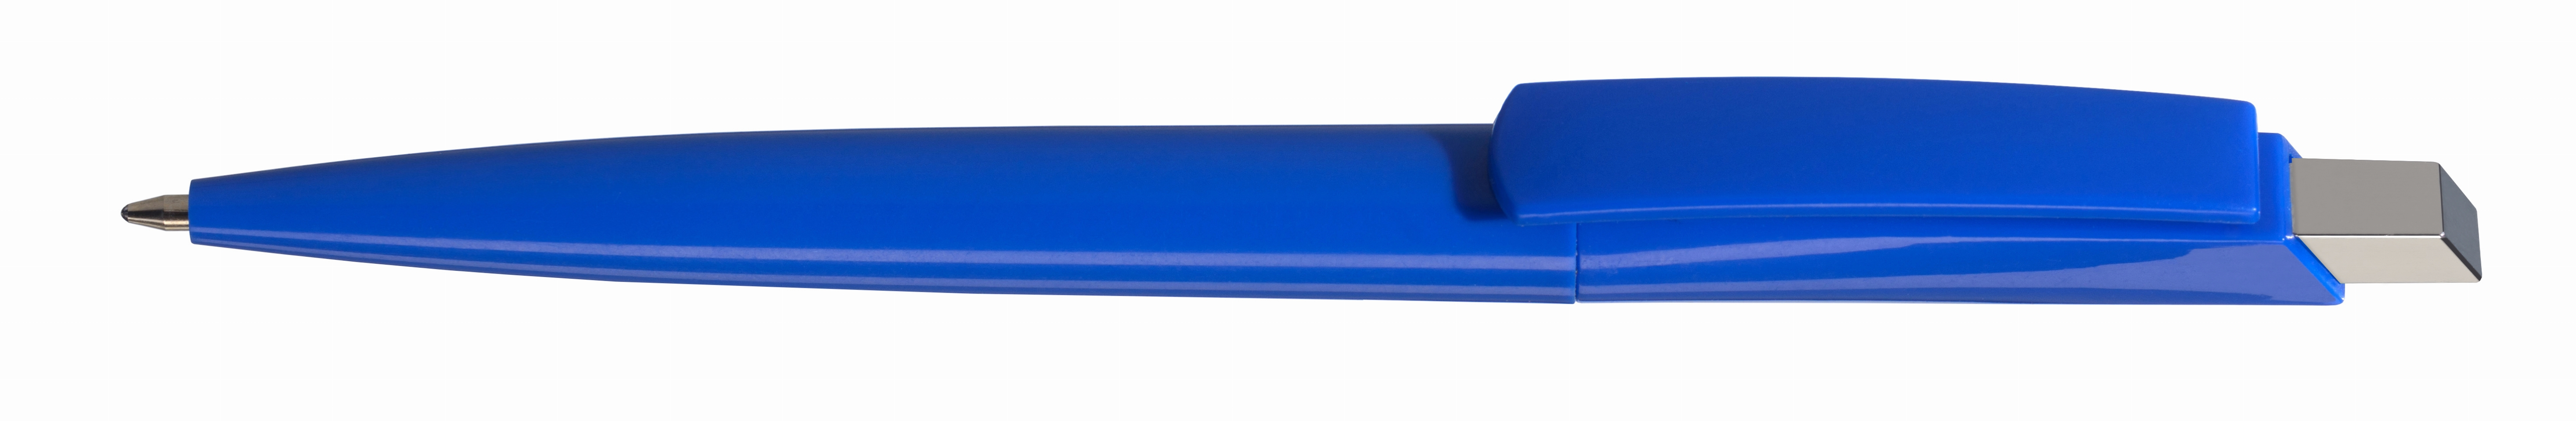 Plastikowe długopisy reklamowe – GITO